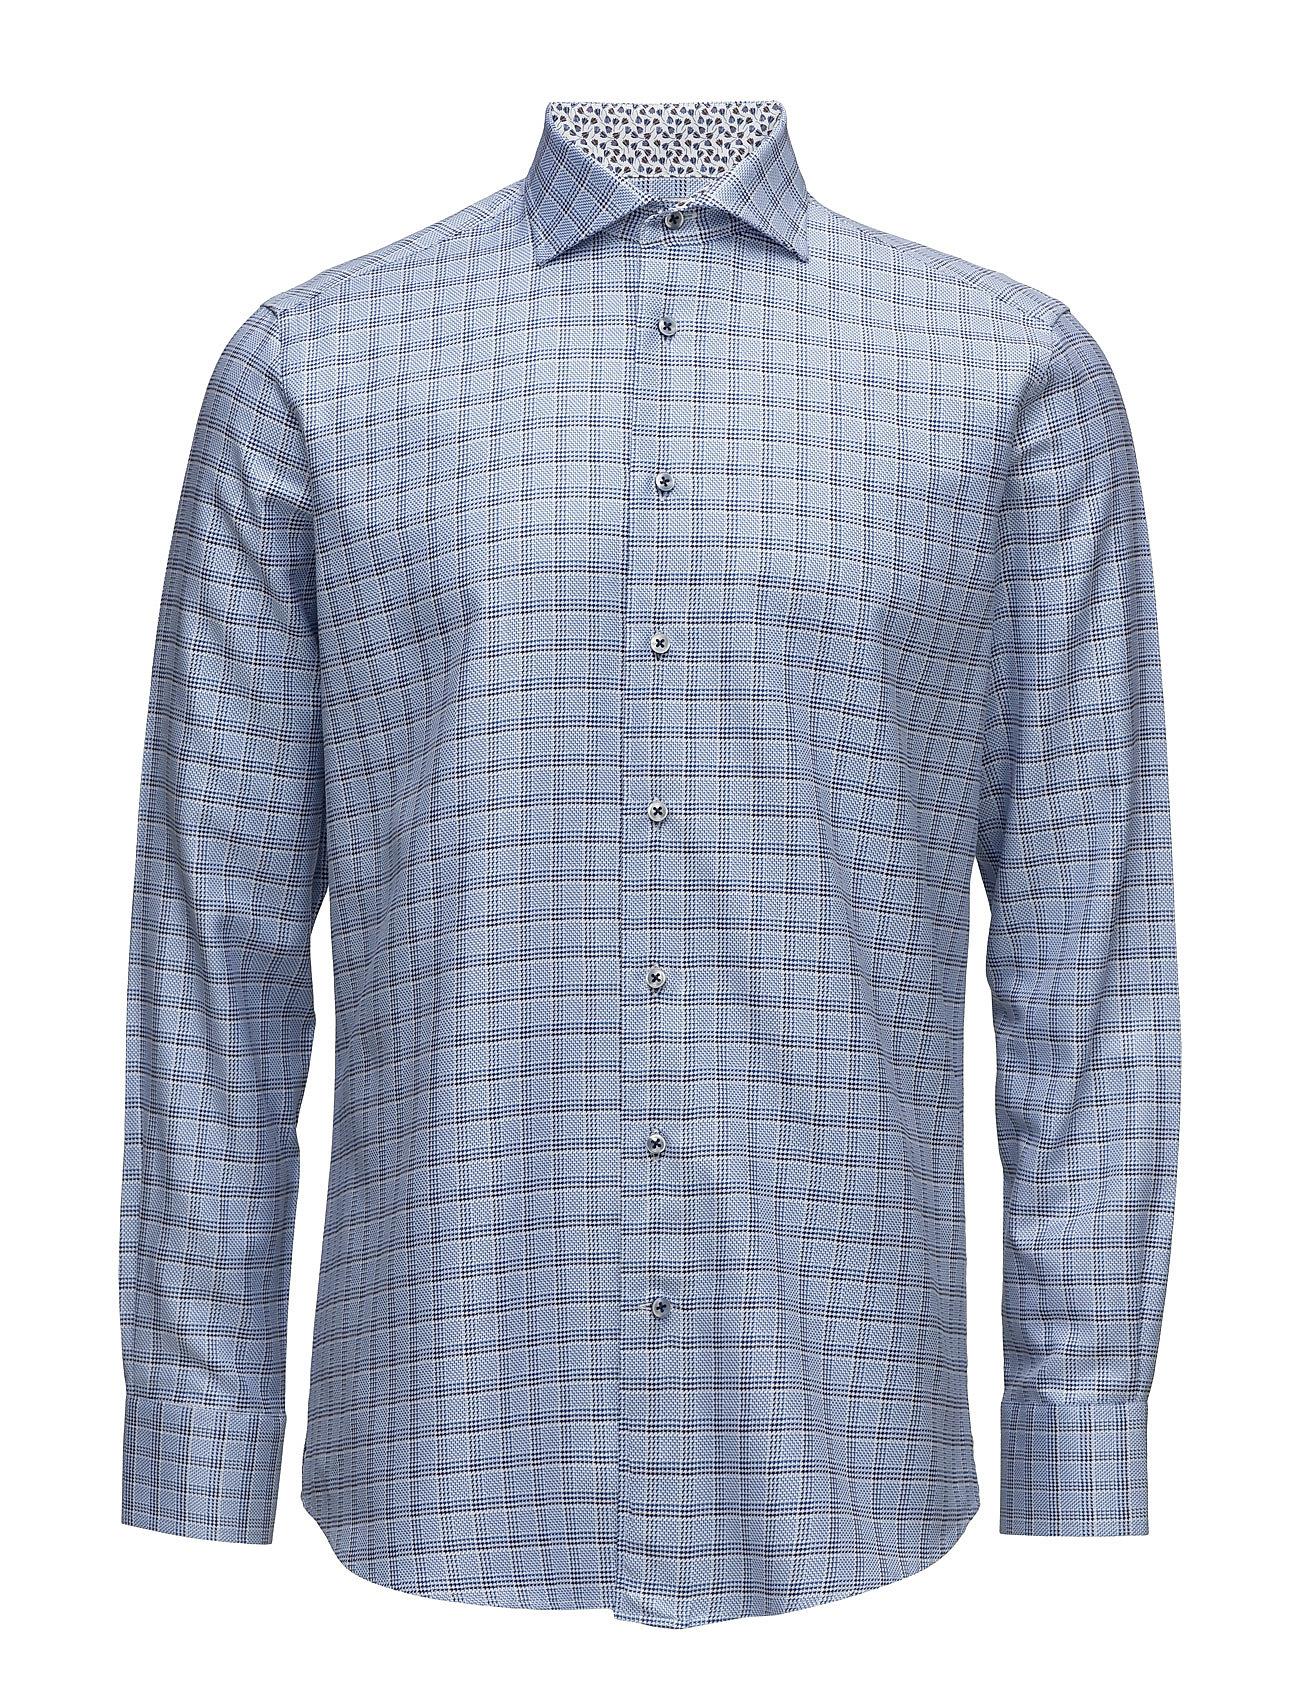 xo shirtmaker – 8821 details - gordon fc fra boozt.com dk